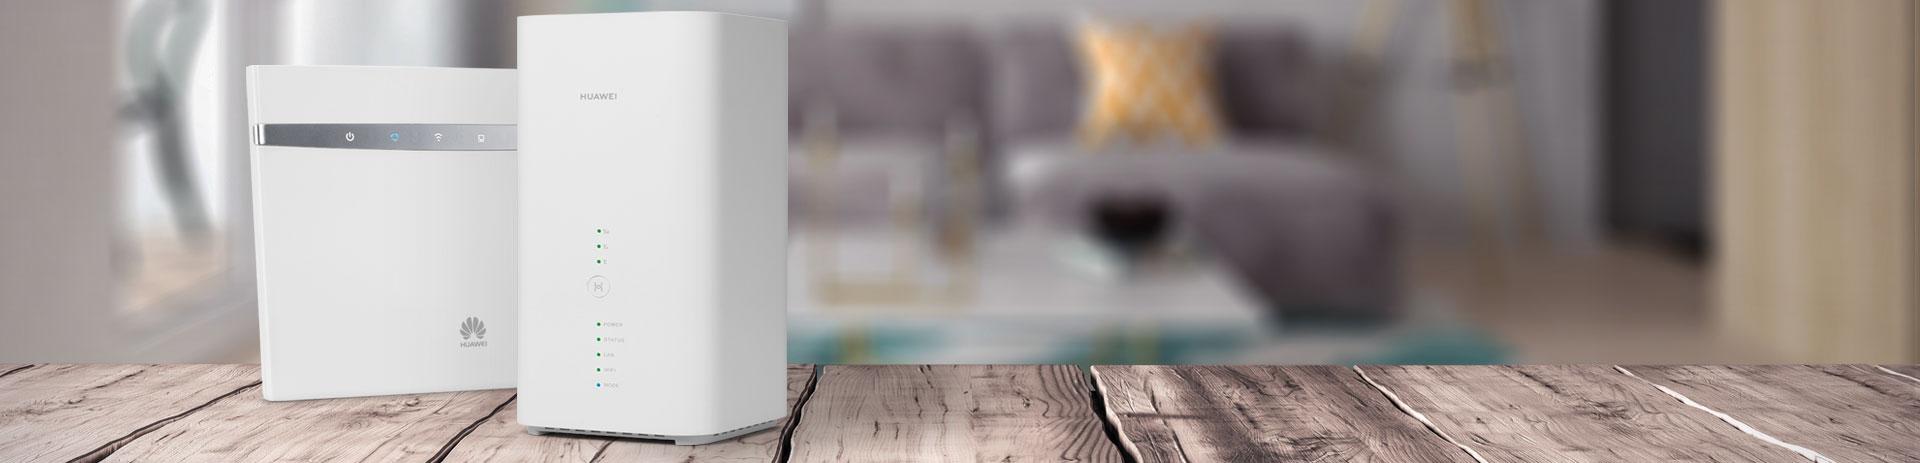 a1 net cube schnelles 4g lte internet f r zuhause. Black Bedroom Furniture Sets. Home Design Ideas